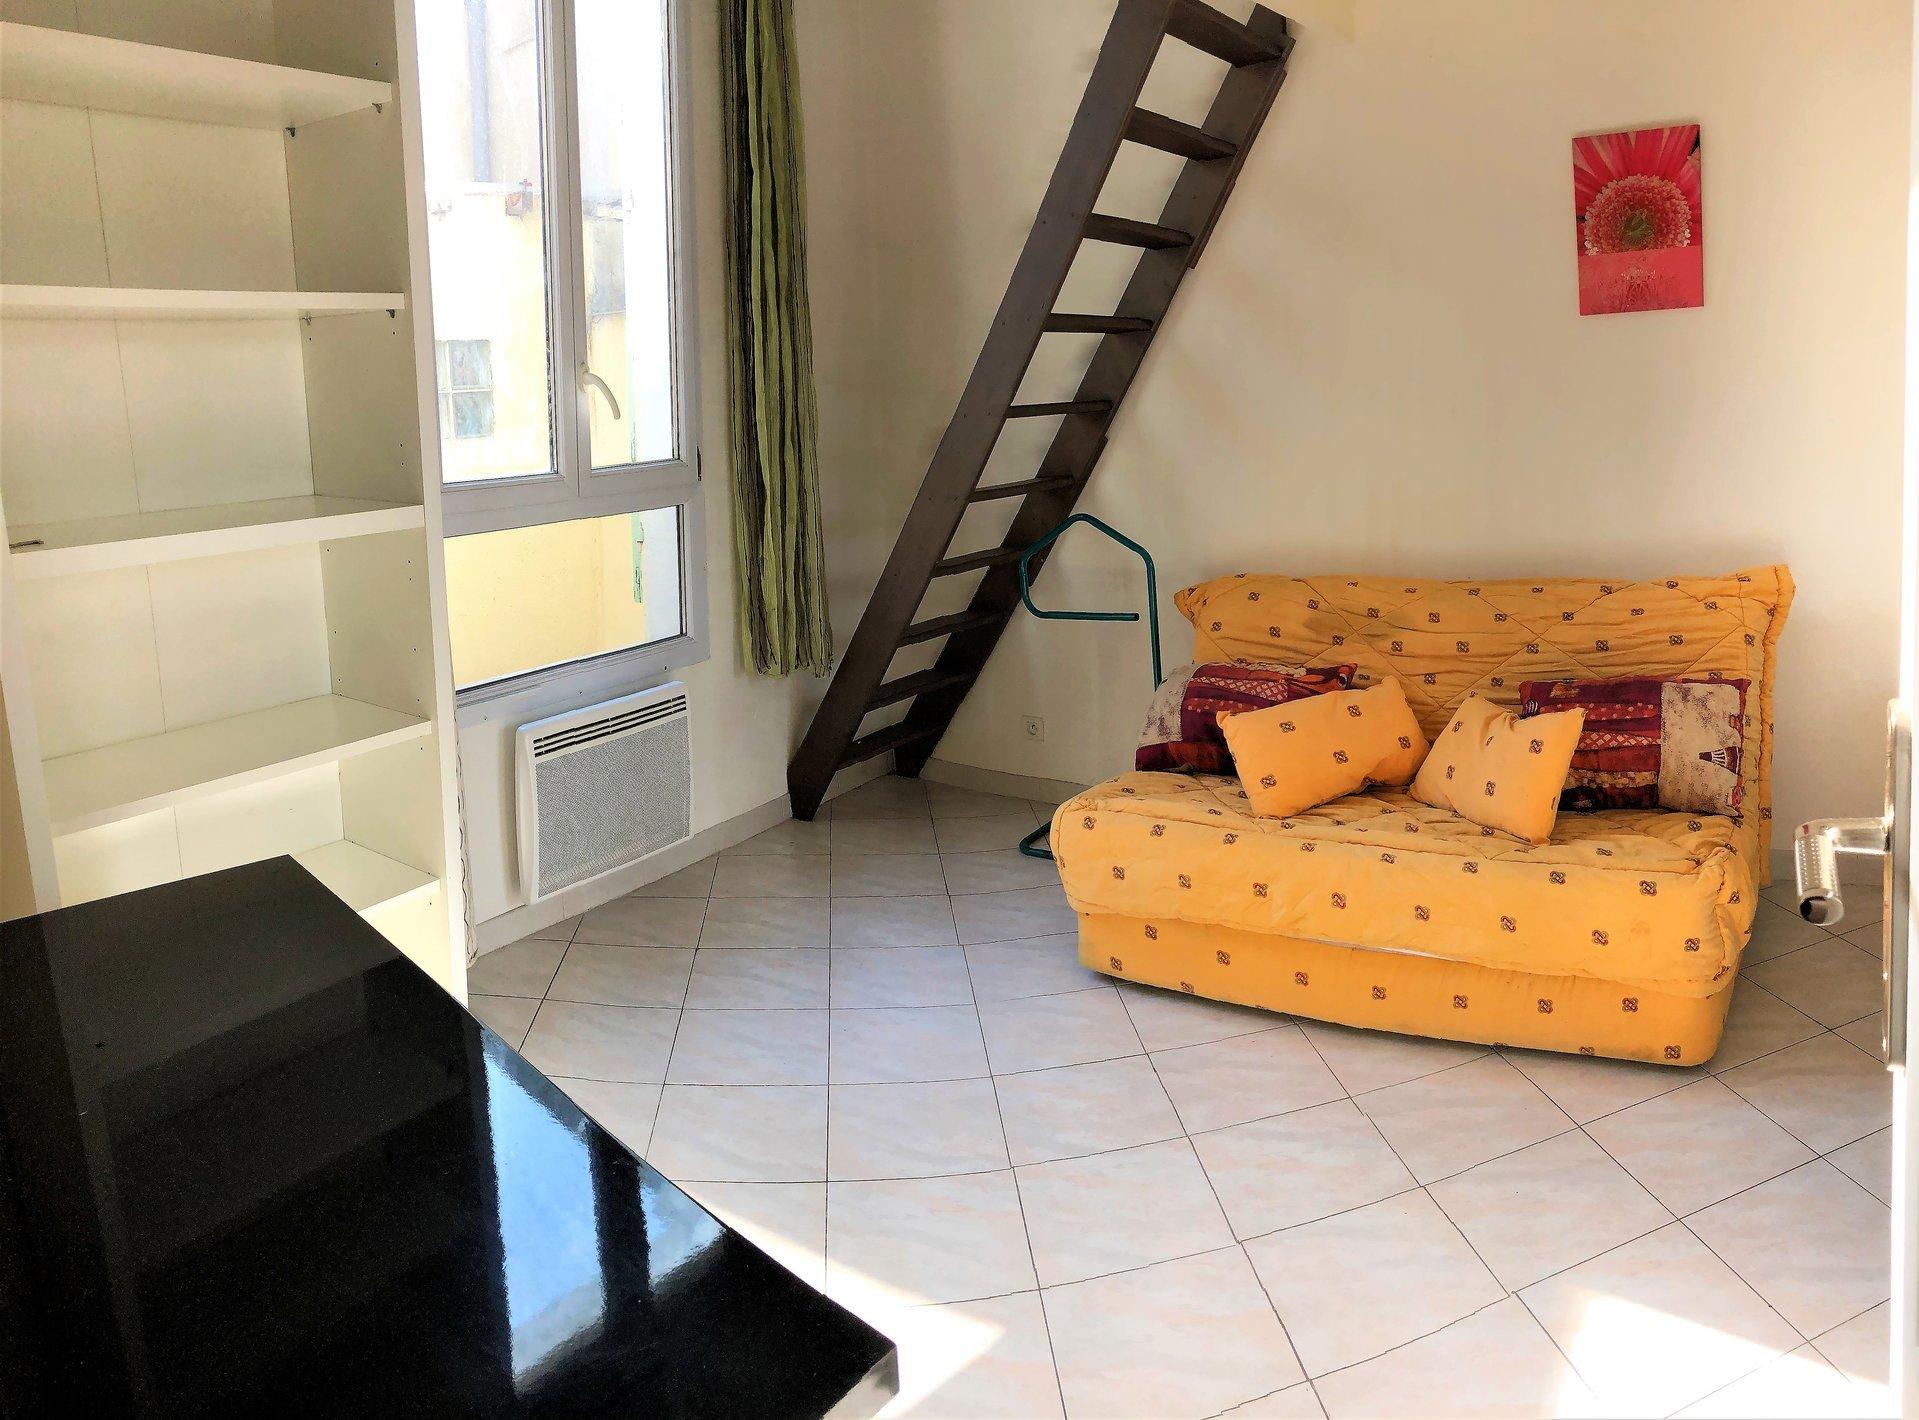 Rental Apartment - Nice Mantega - Righi